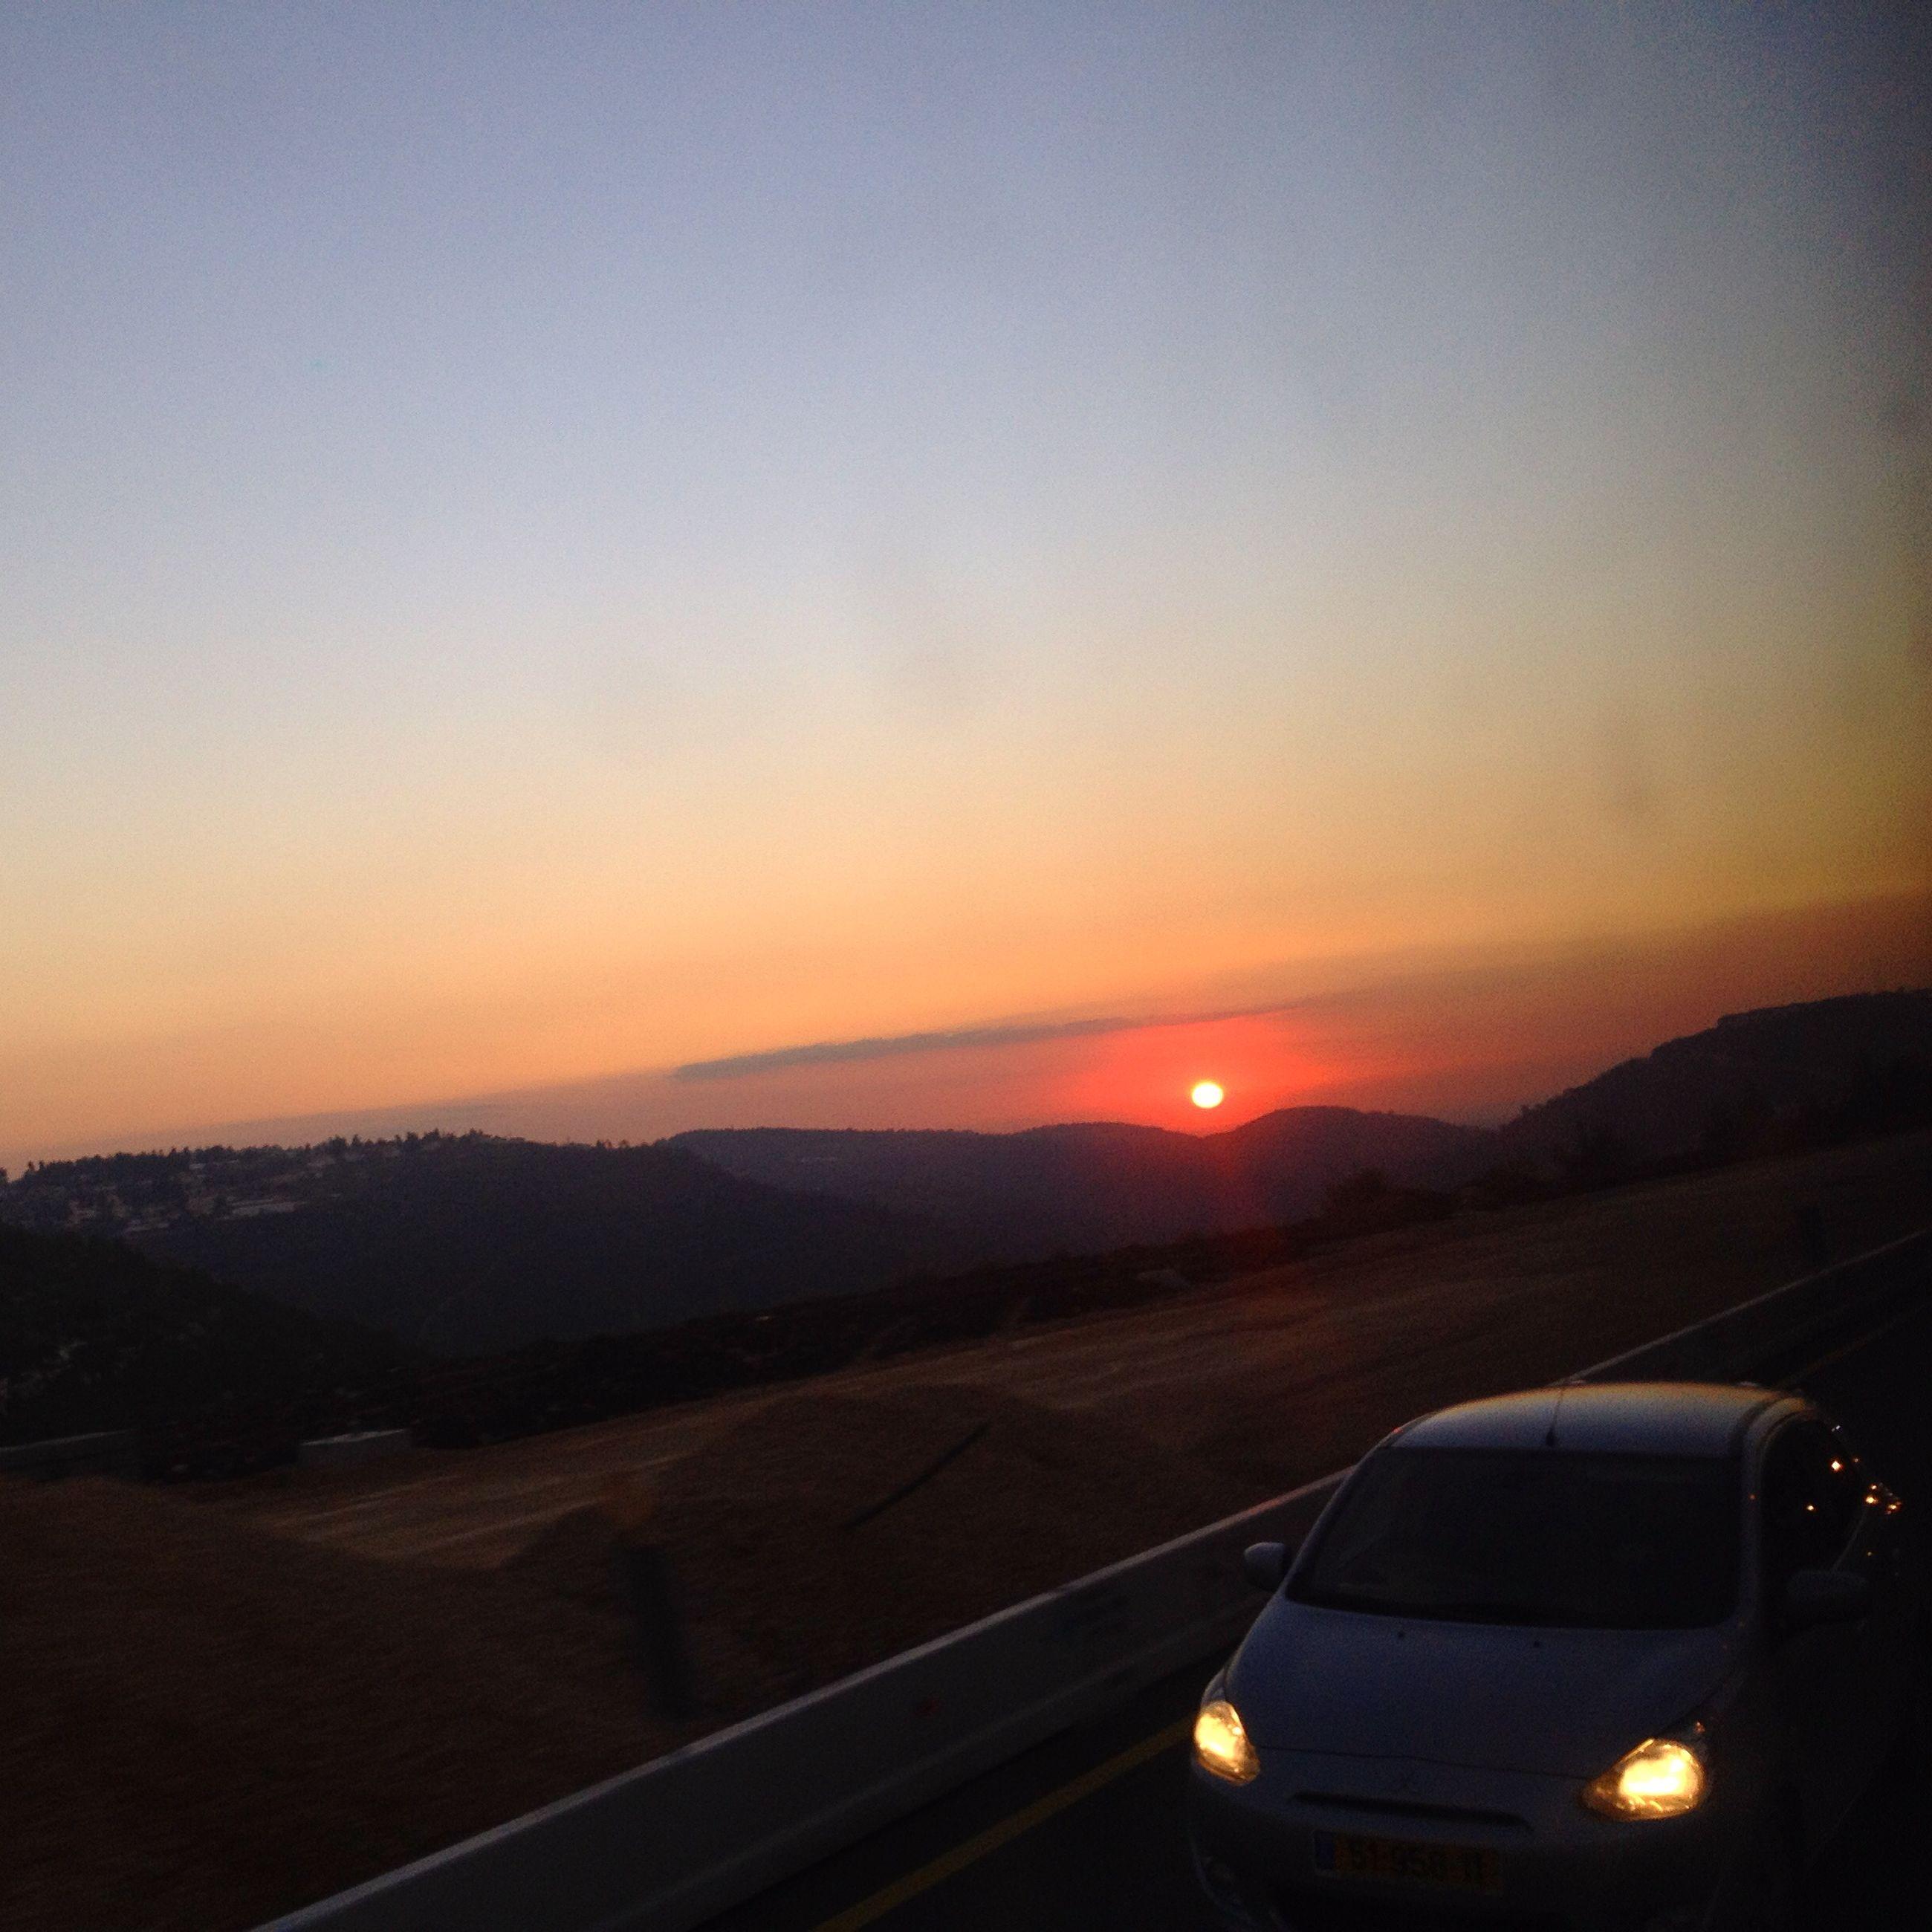 sunset, landscape, orange color, transportation, scenics, beauty in nature, tranquil scene, mountain, silhouette, sun, copy space, tranquility, nature, sky, clear sky, mode of transport, mountain range, idyllic, dusk, horizon over land